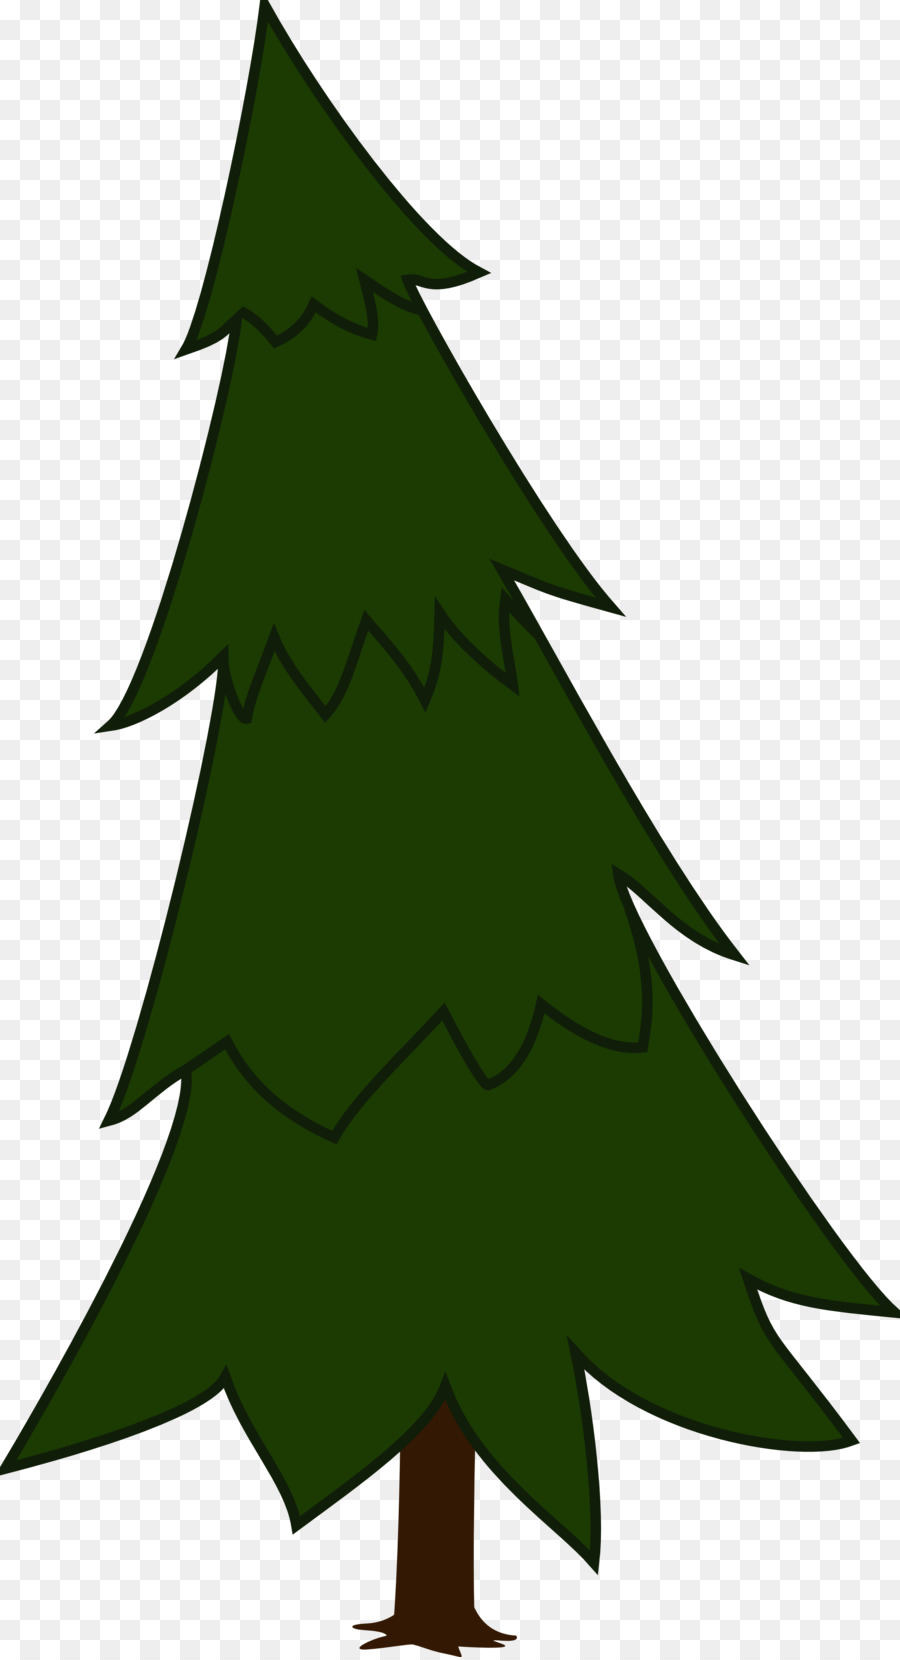 900x1660 Pine Tree Spruce Clip Art